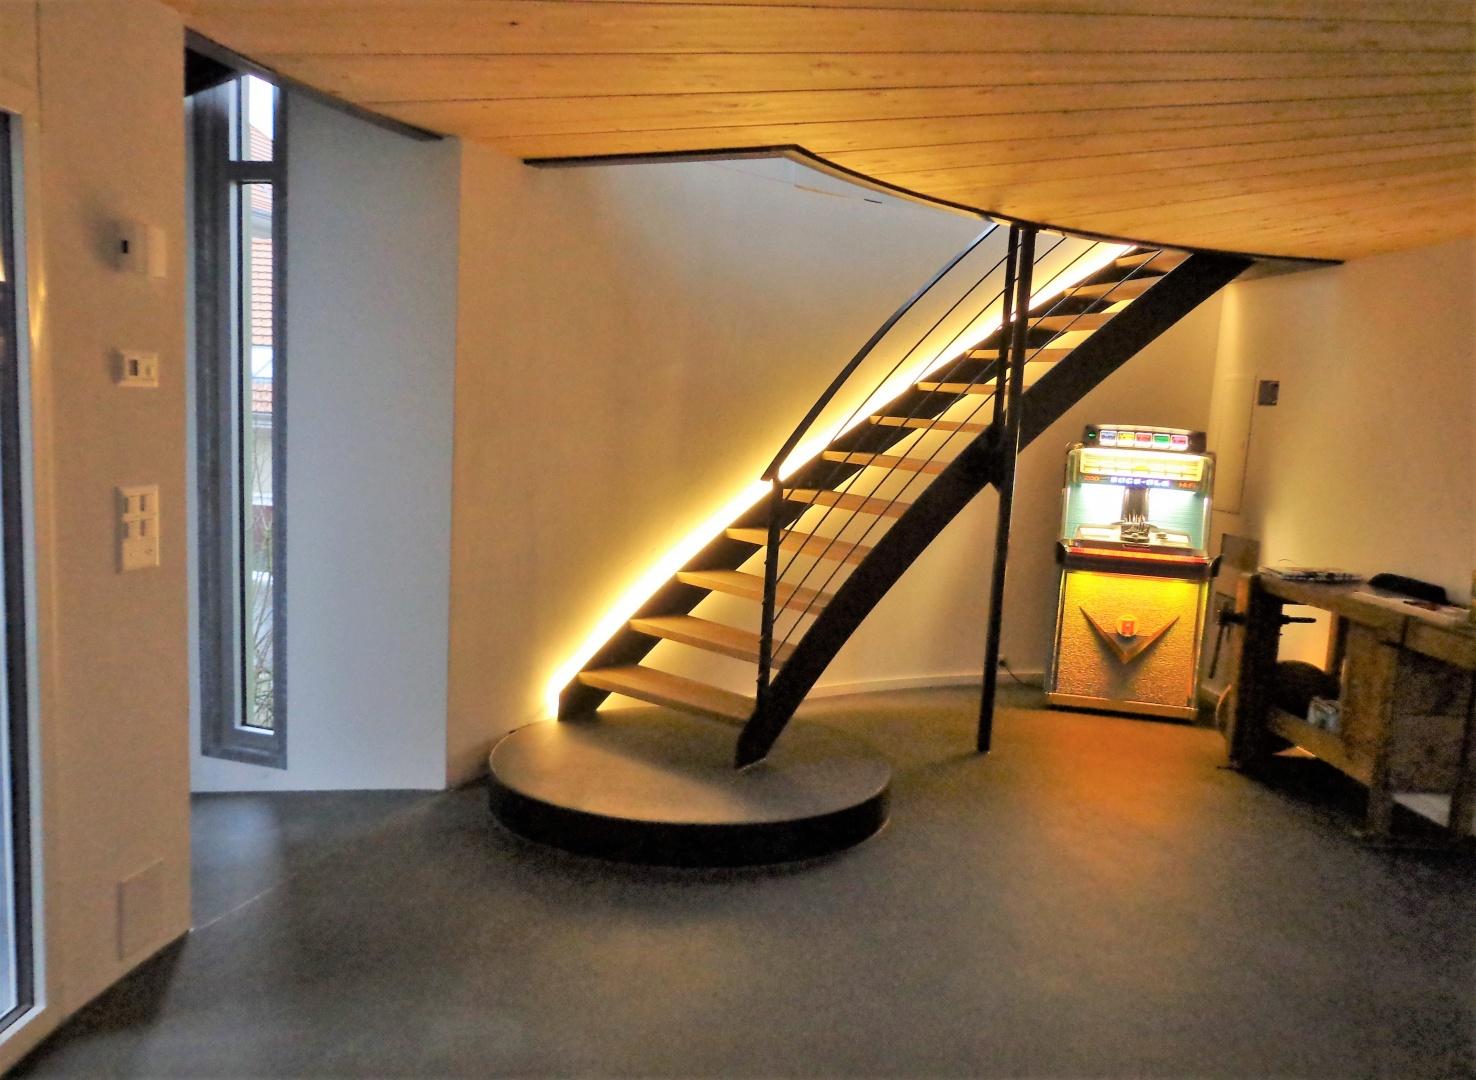 Escalier vers étage mansardé © Fred Wittwer